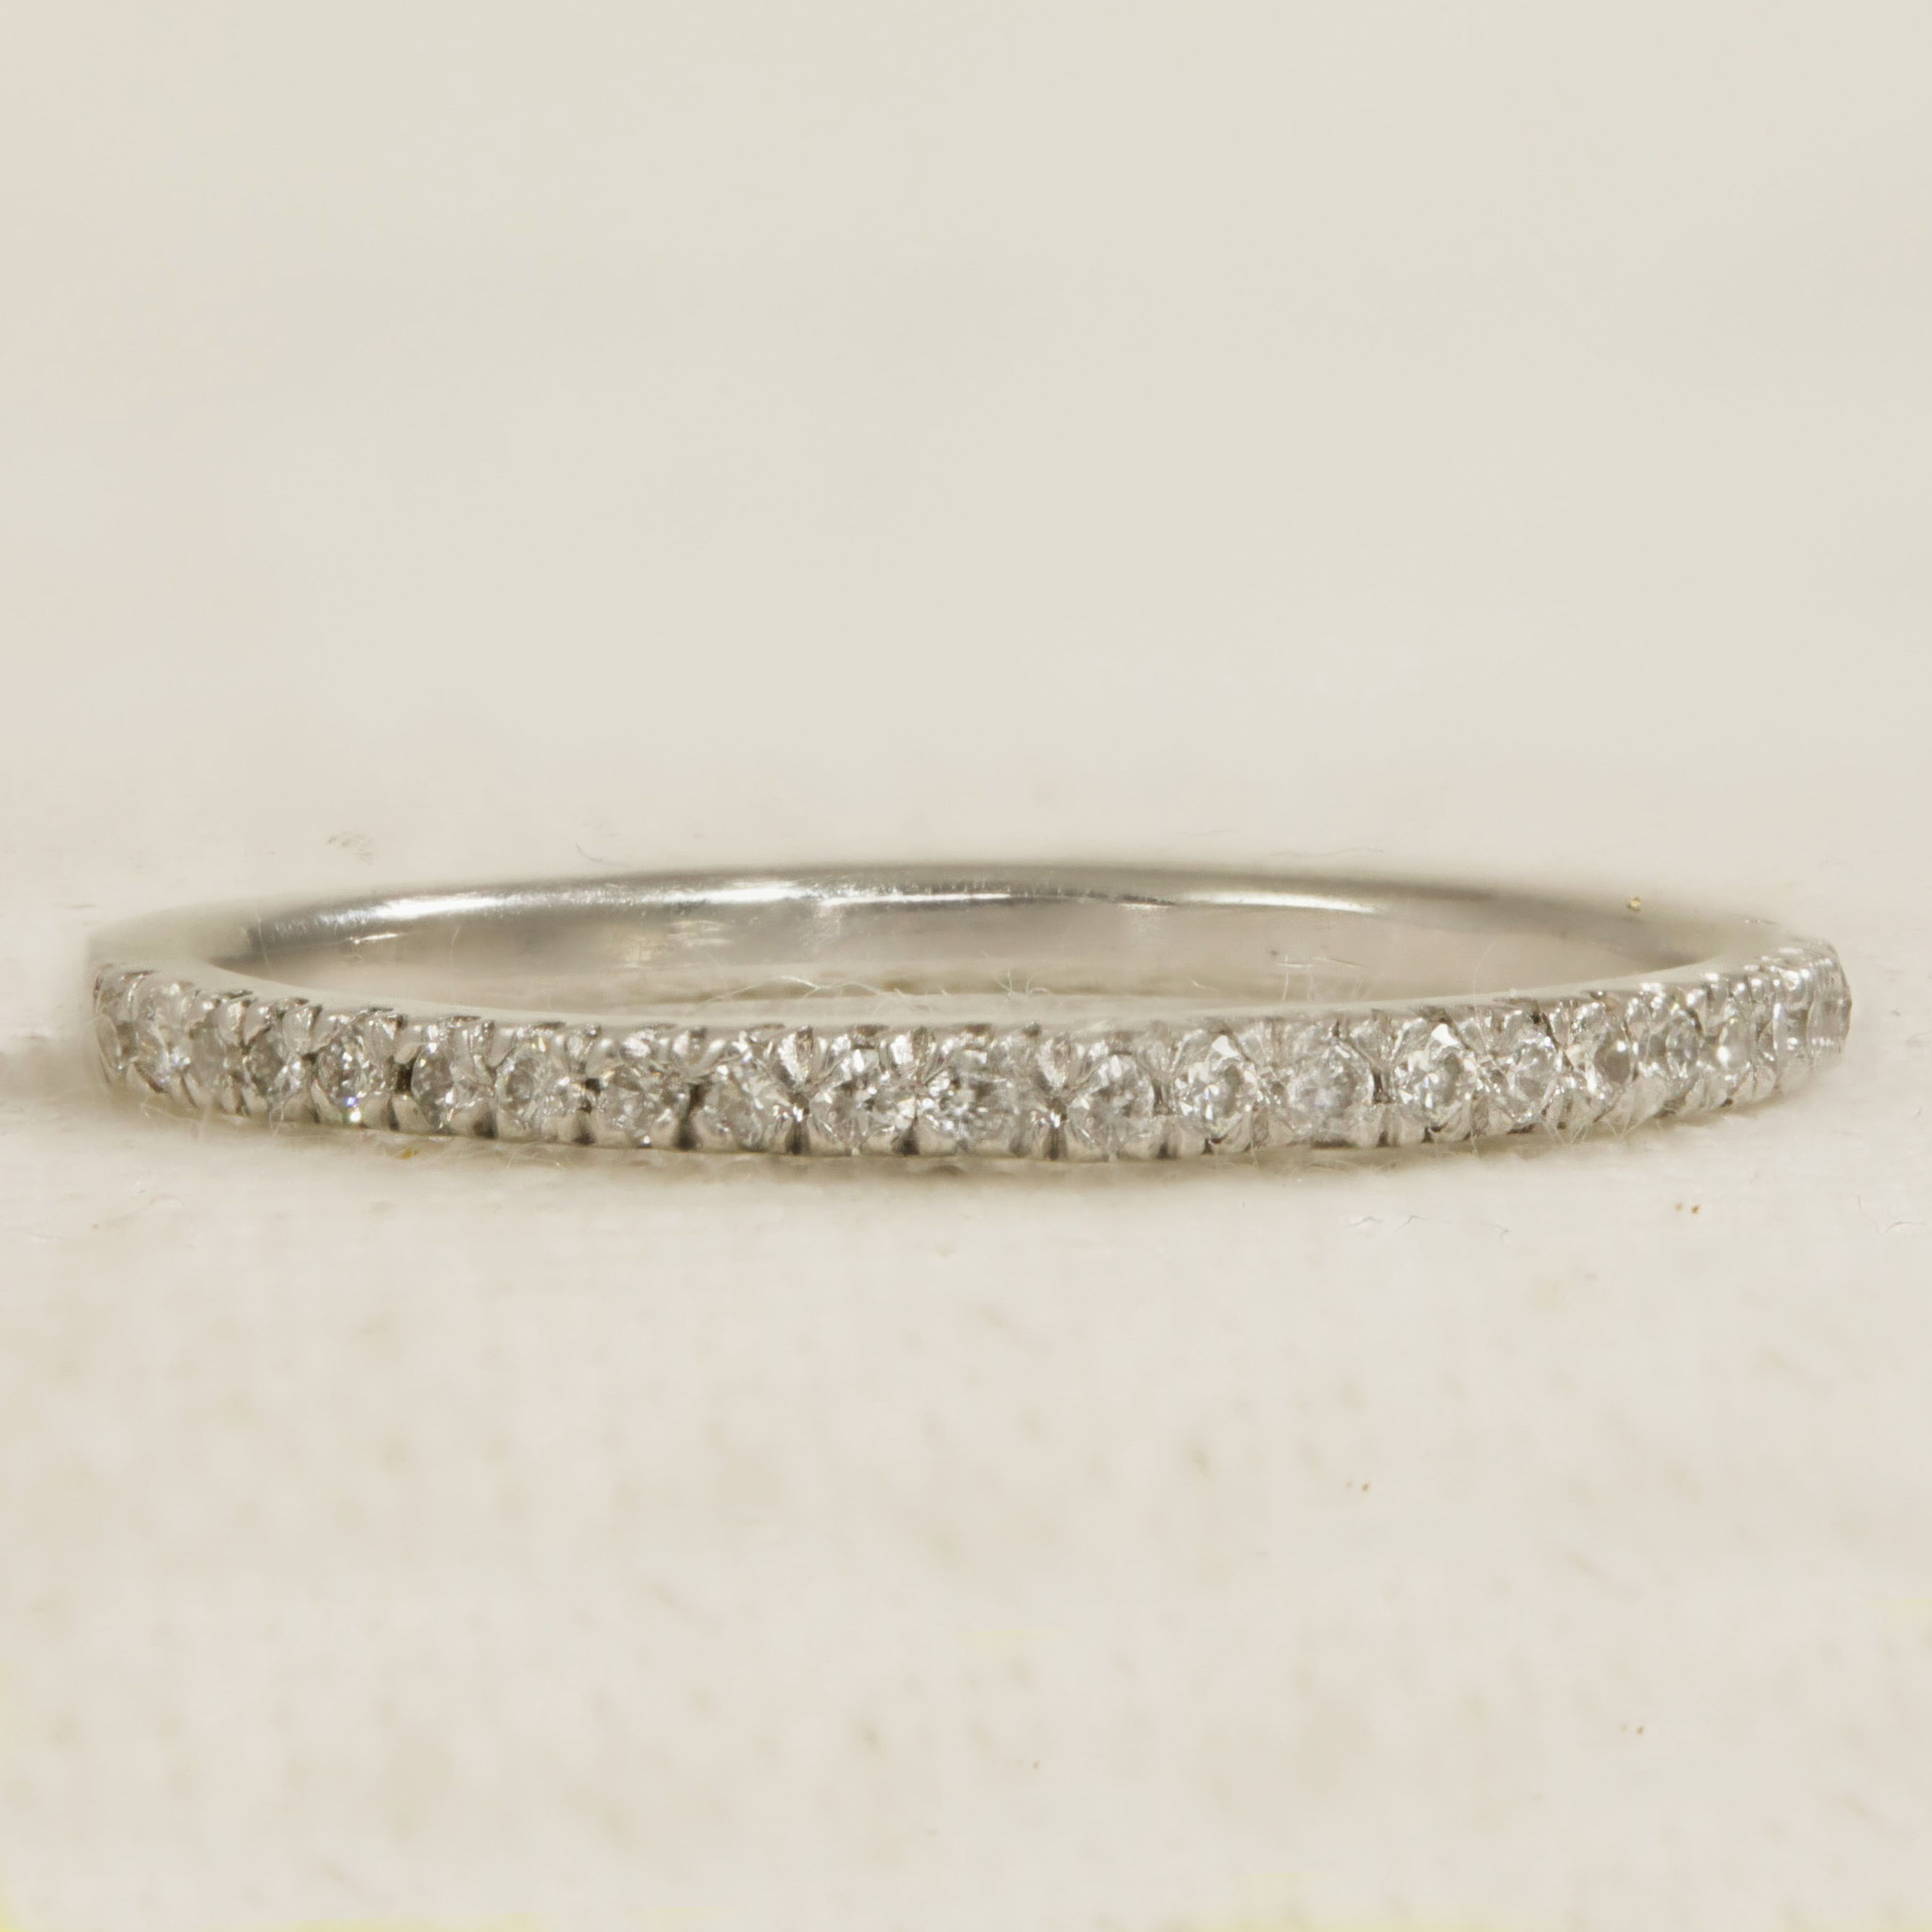 Half set 18k white gold straight ring